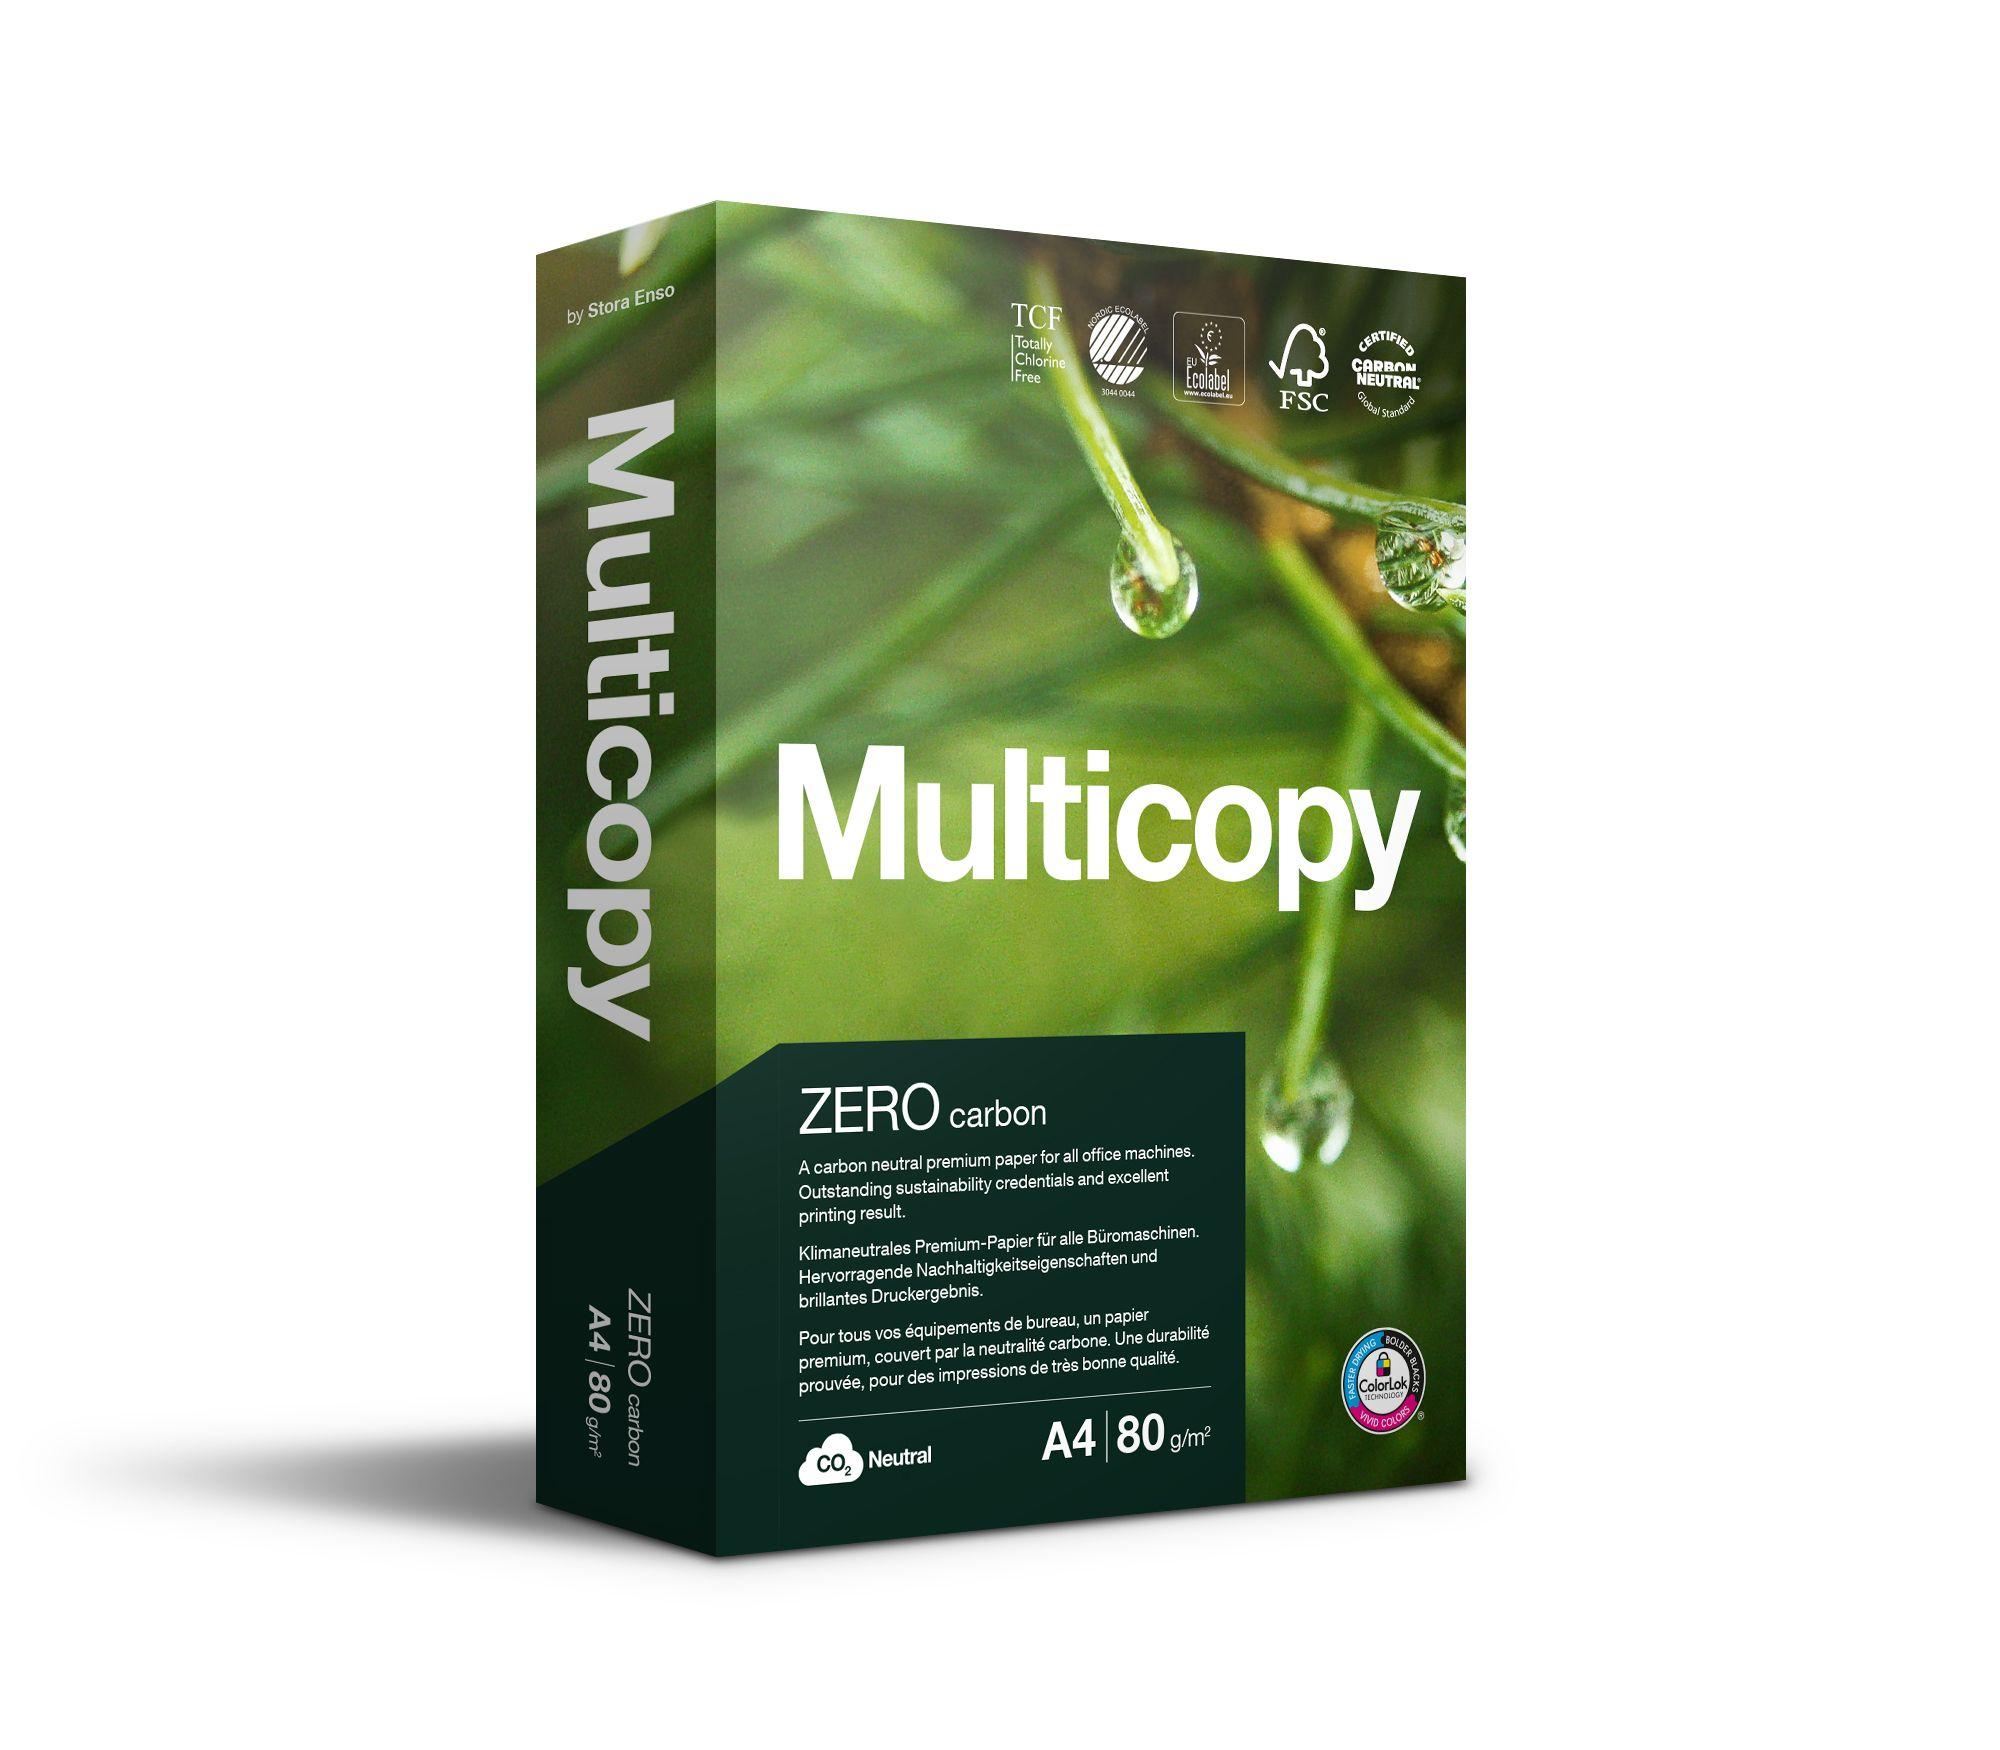 Multicopy kopipapir Zero, A4, 80g (bunt med 500 ark) 158001